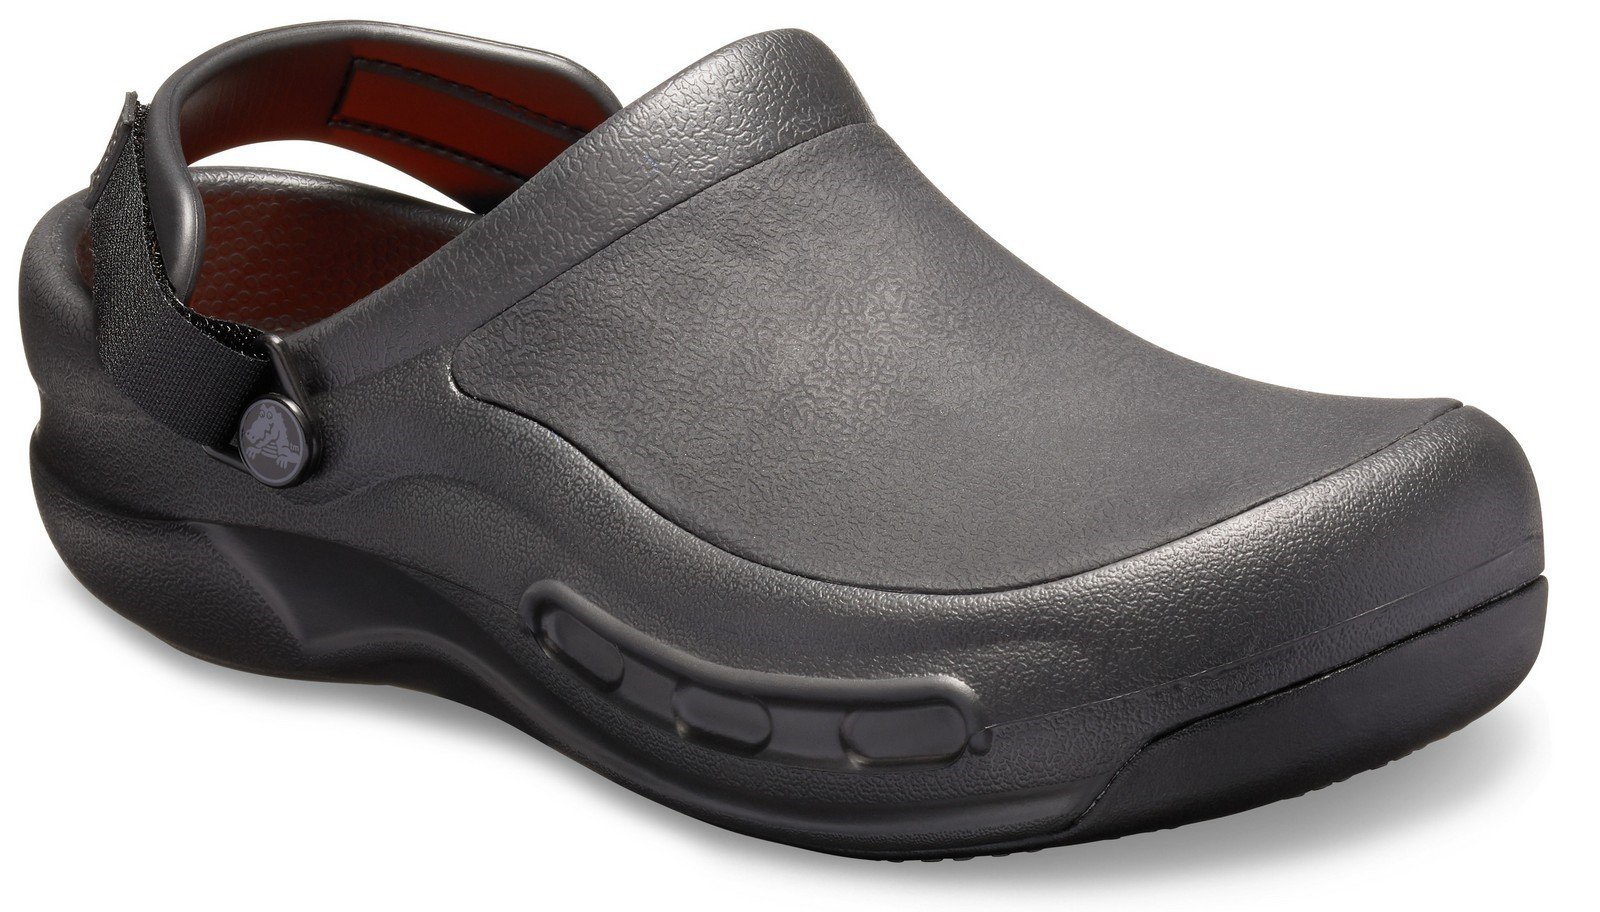 Crocs Unisex Bistro Pro Literide Clog Slip On Sandal Various Colours 28785 - Black 3